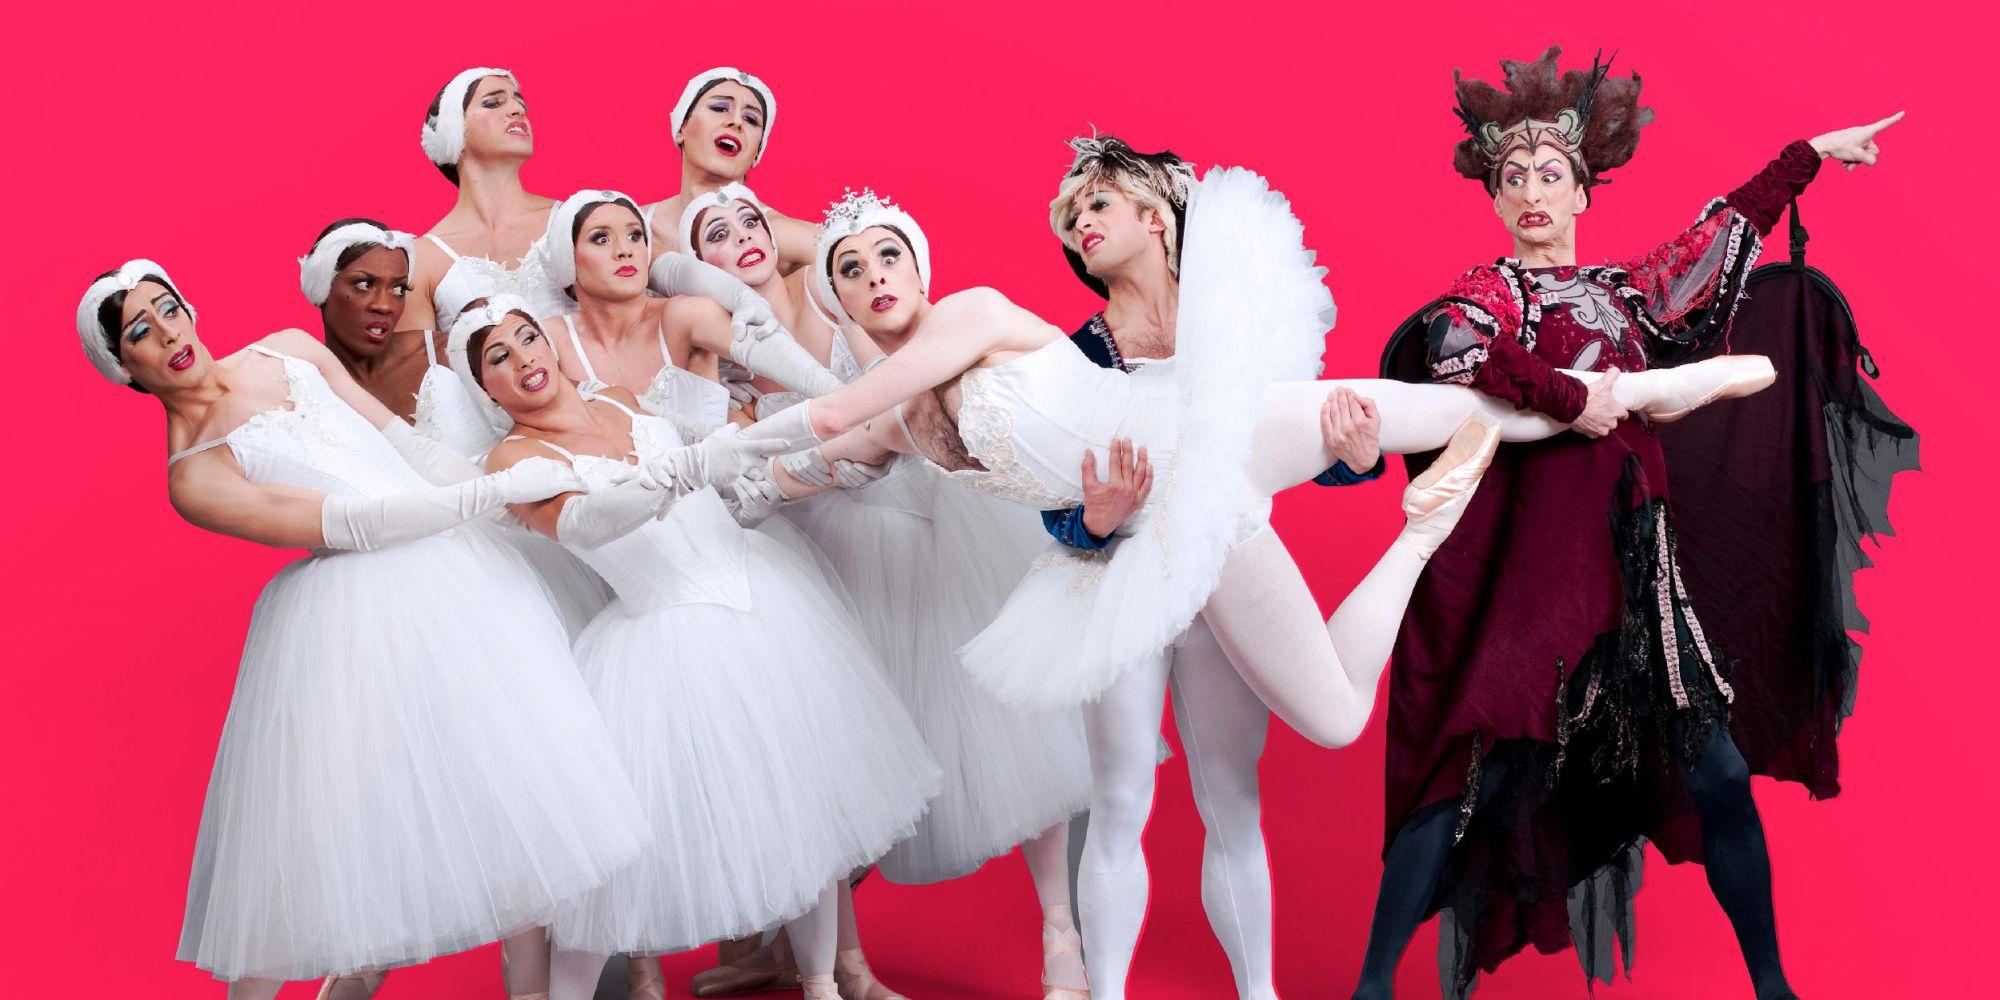 les ballets trockadero de monte carlo the marlowe